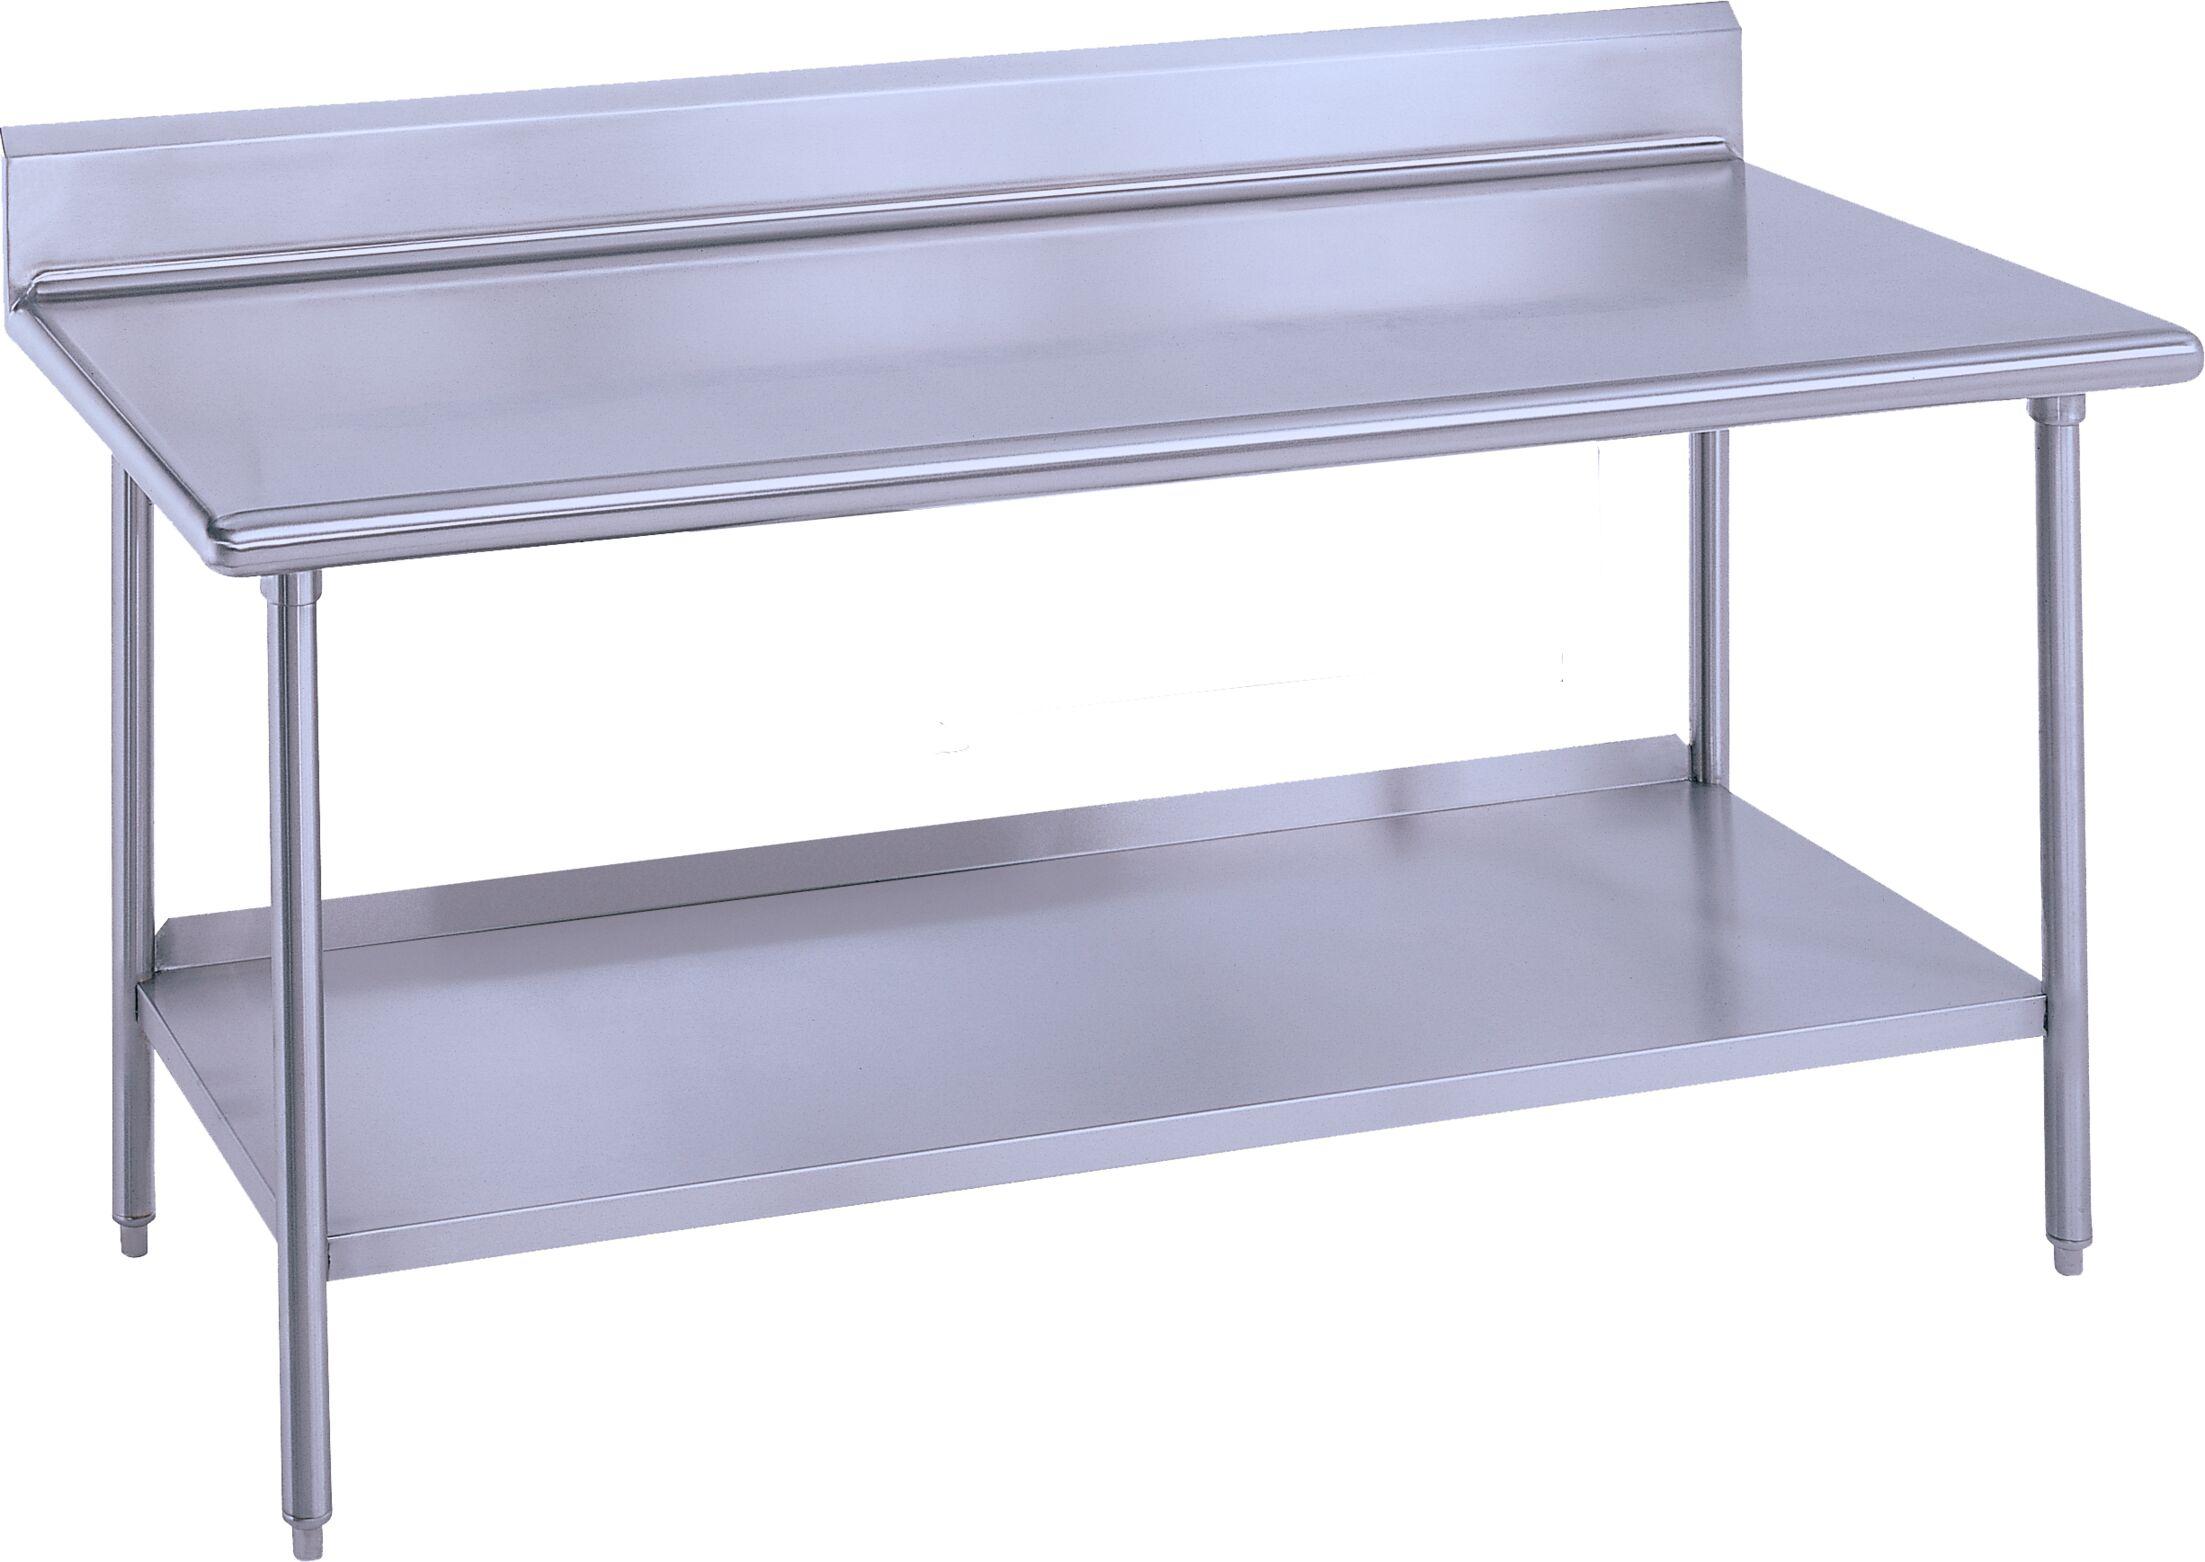 Worktable Utility Prep Table Size: 34